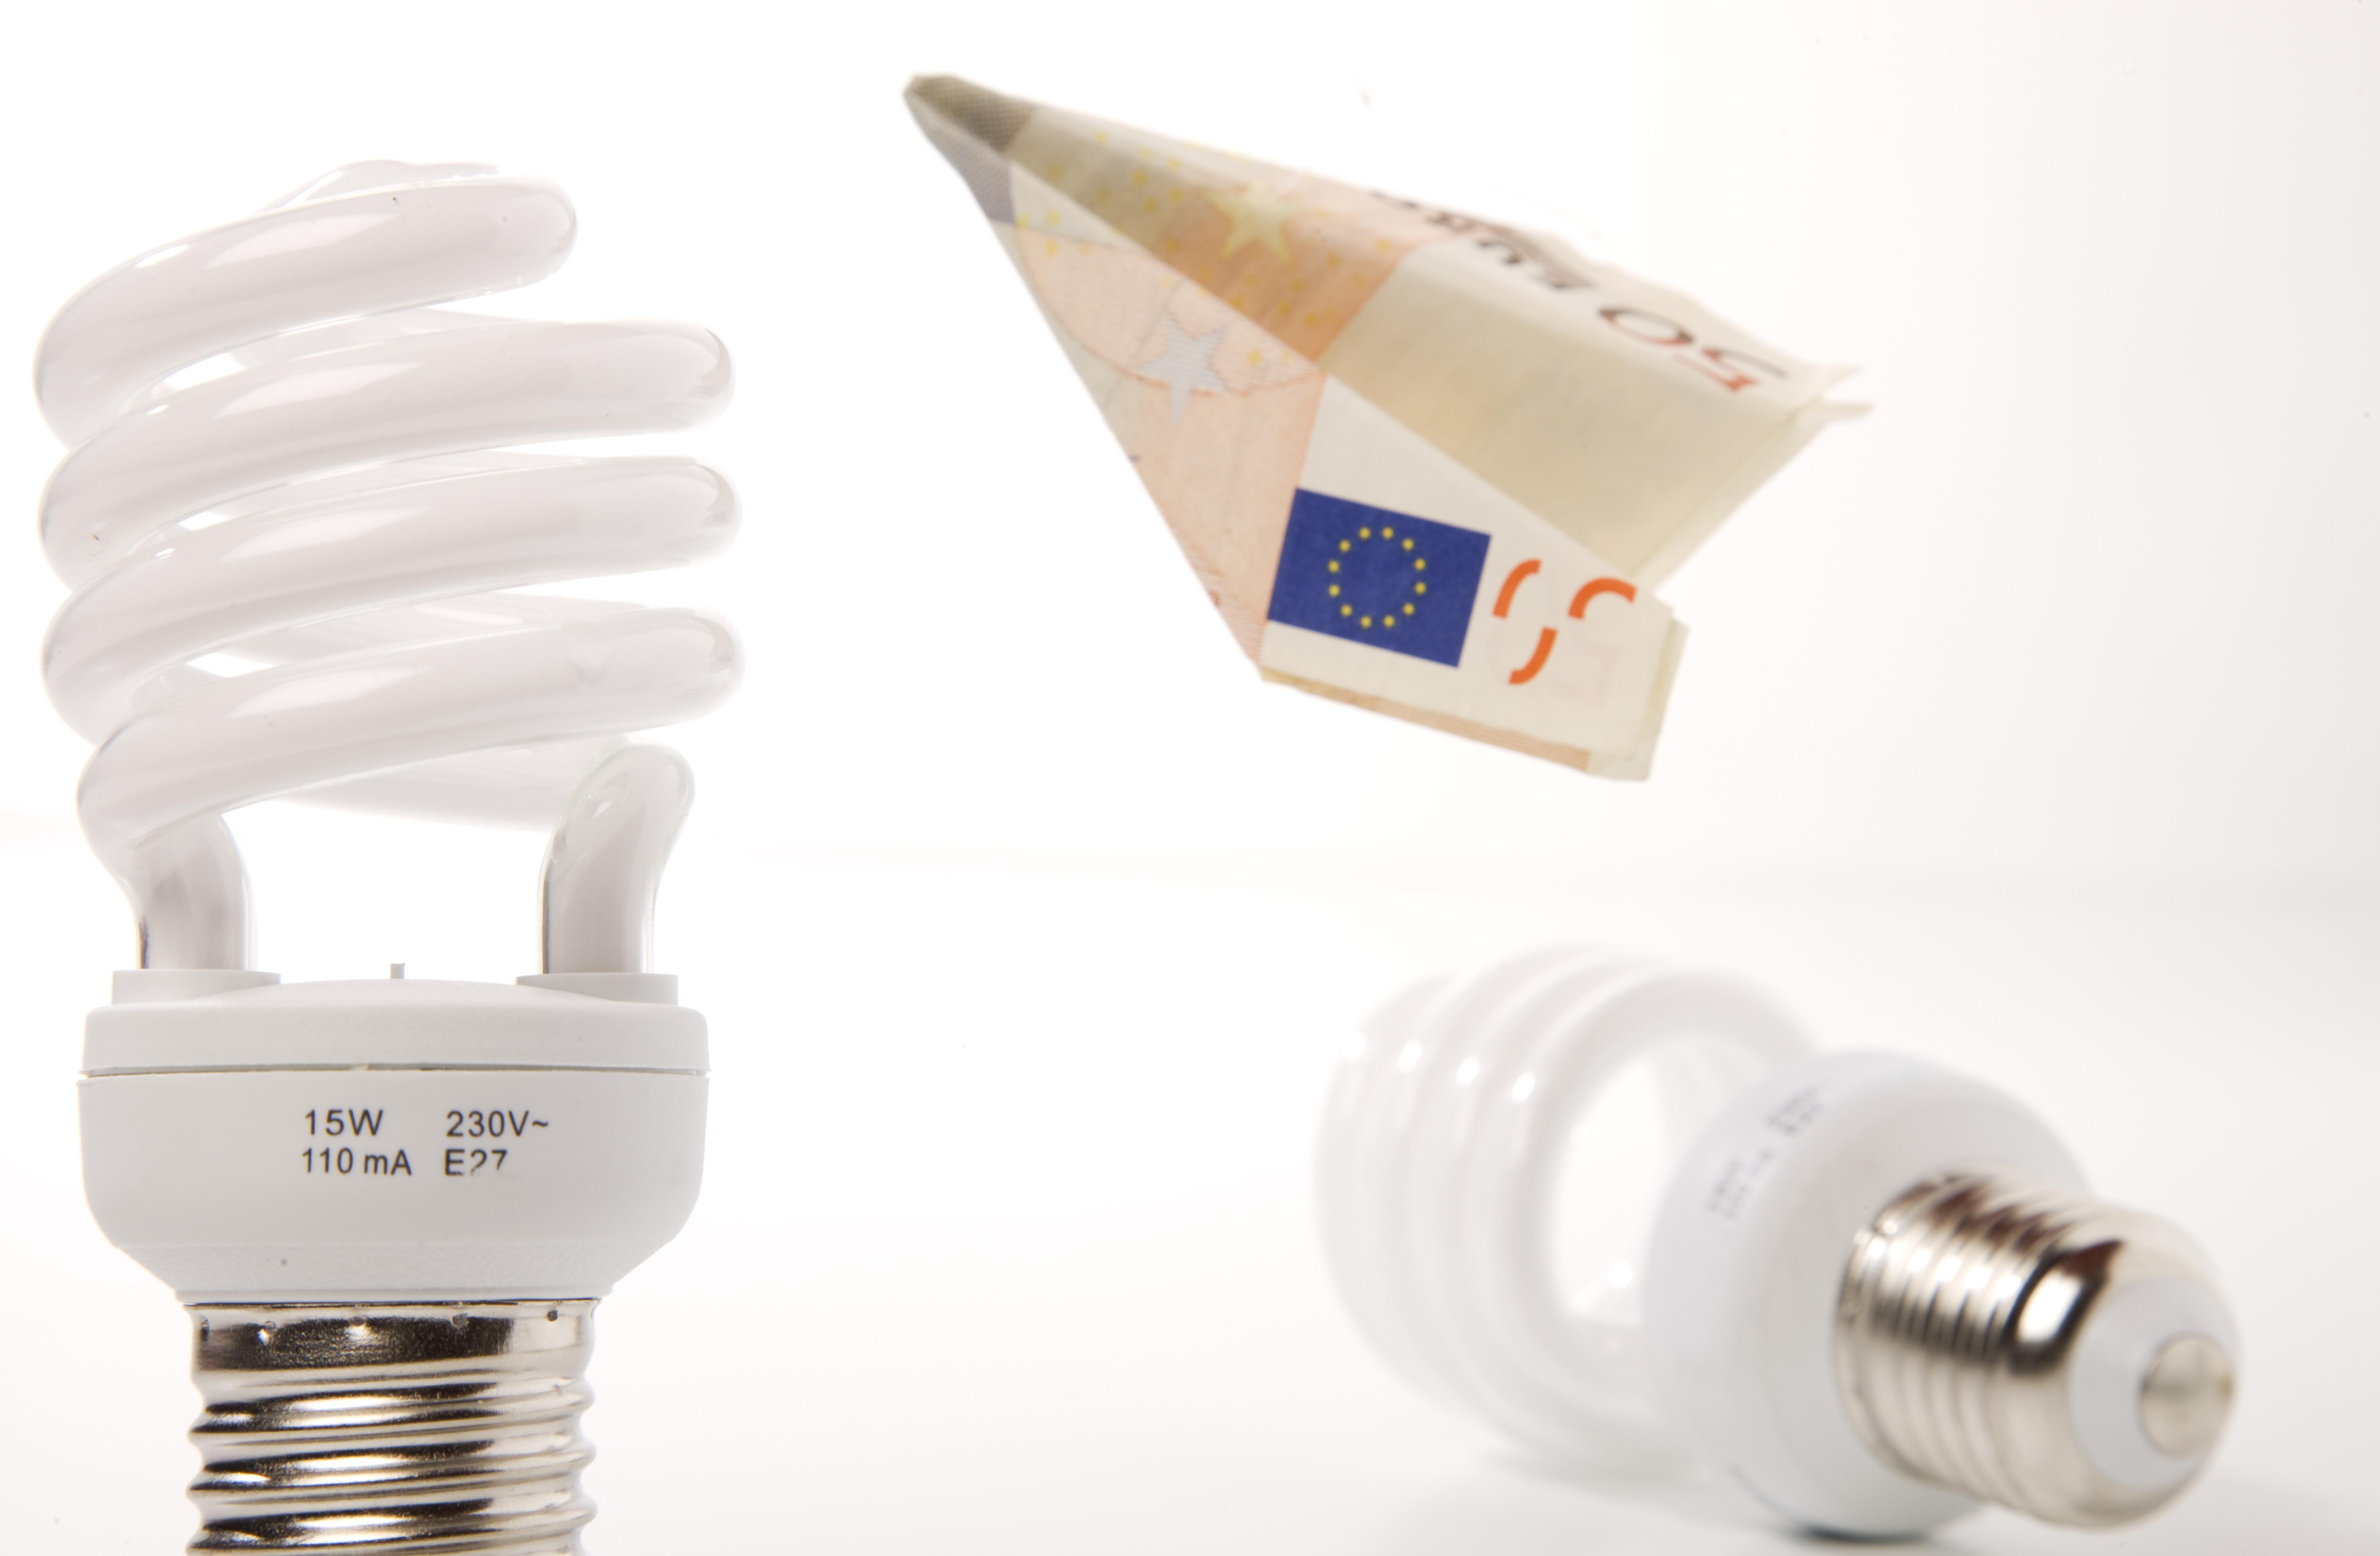 Free Images Environment Money Energy Revolution Elektrik Count Datailaufnahme